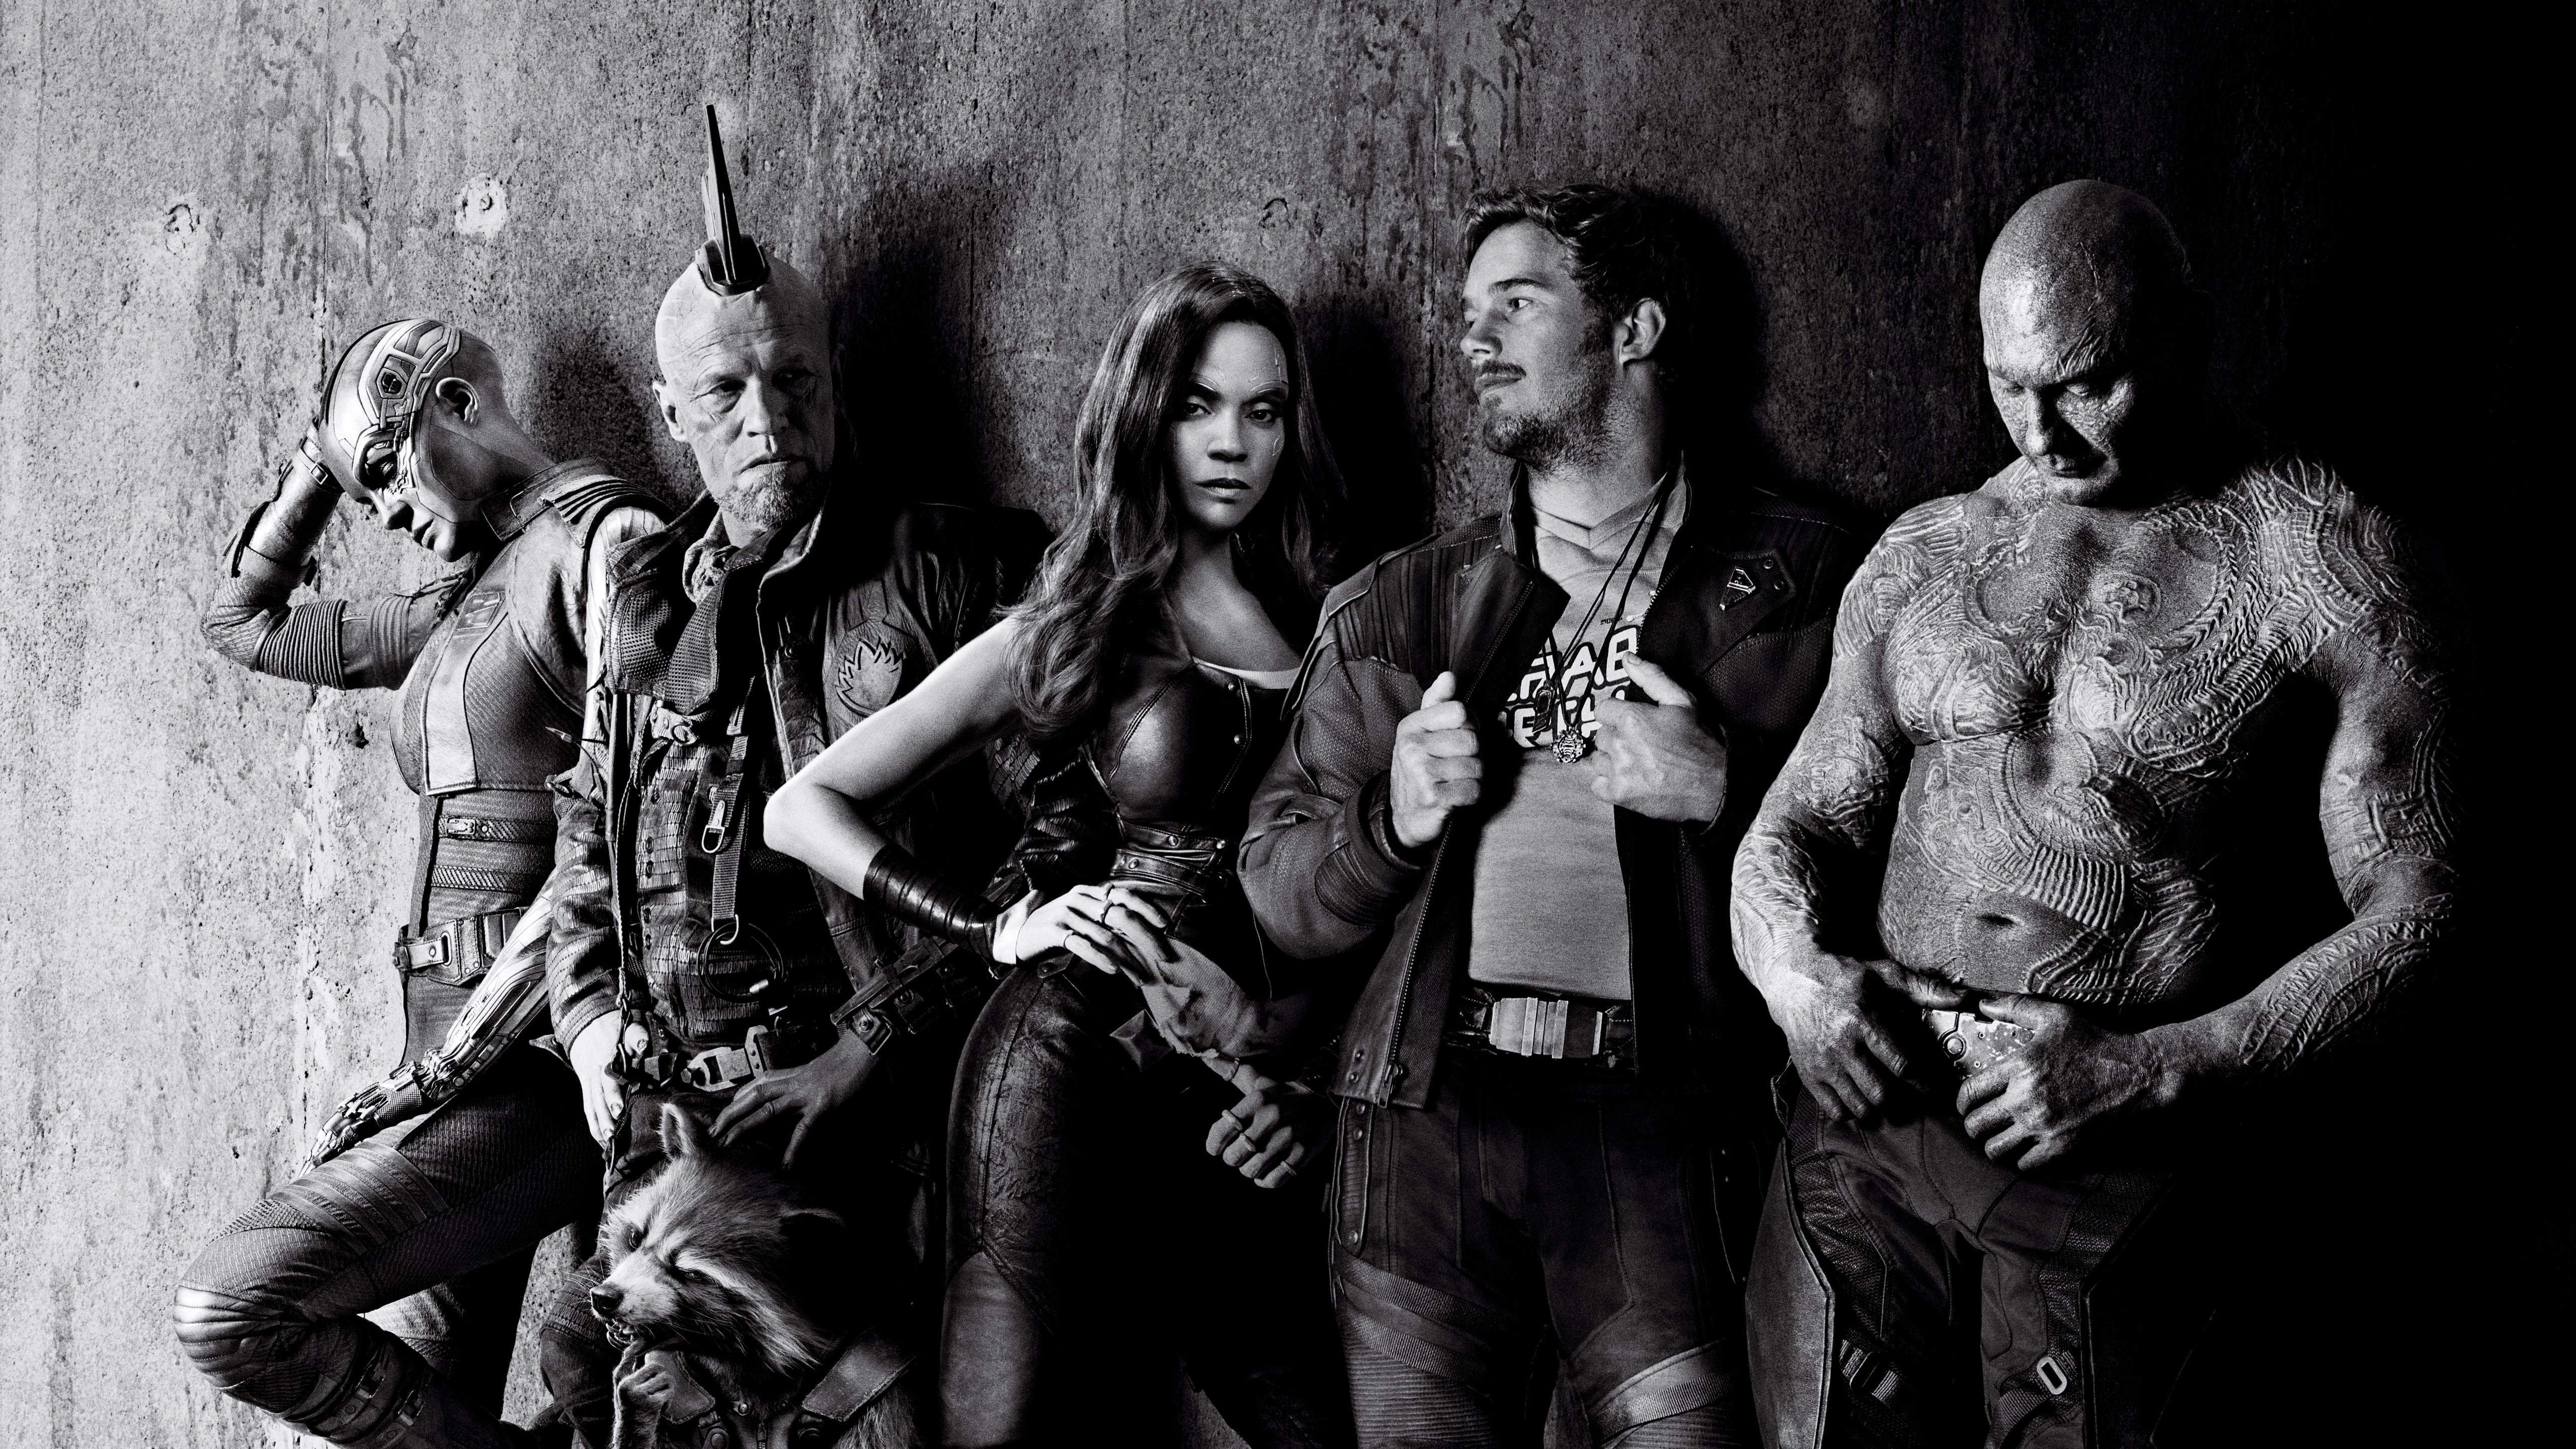 Guardians Of The Galaxy Vol 2 Wallpaper: Guardians Of The Galaxy 2 5k, HD Movies, 4k Wallpapers